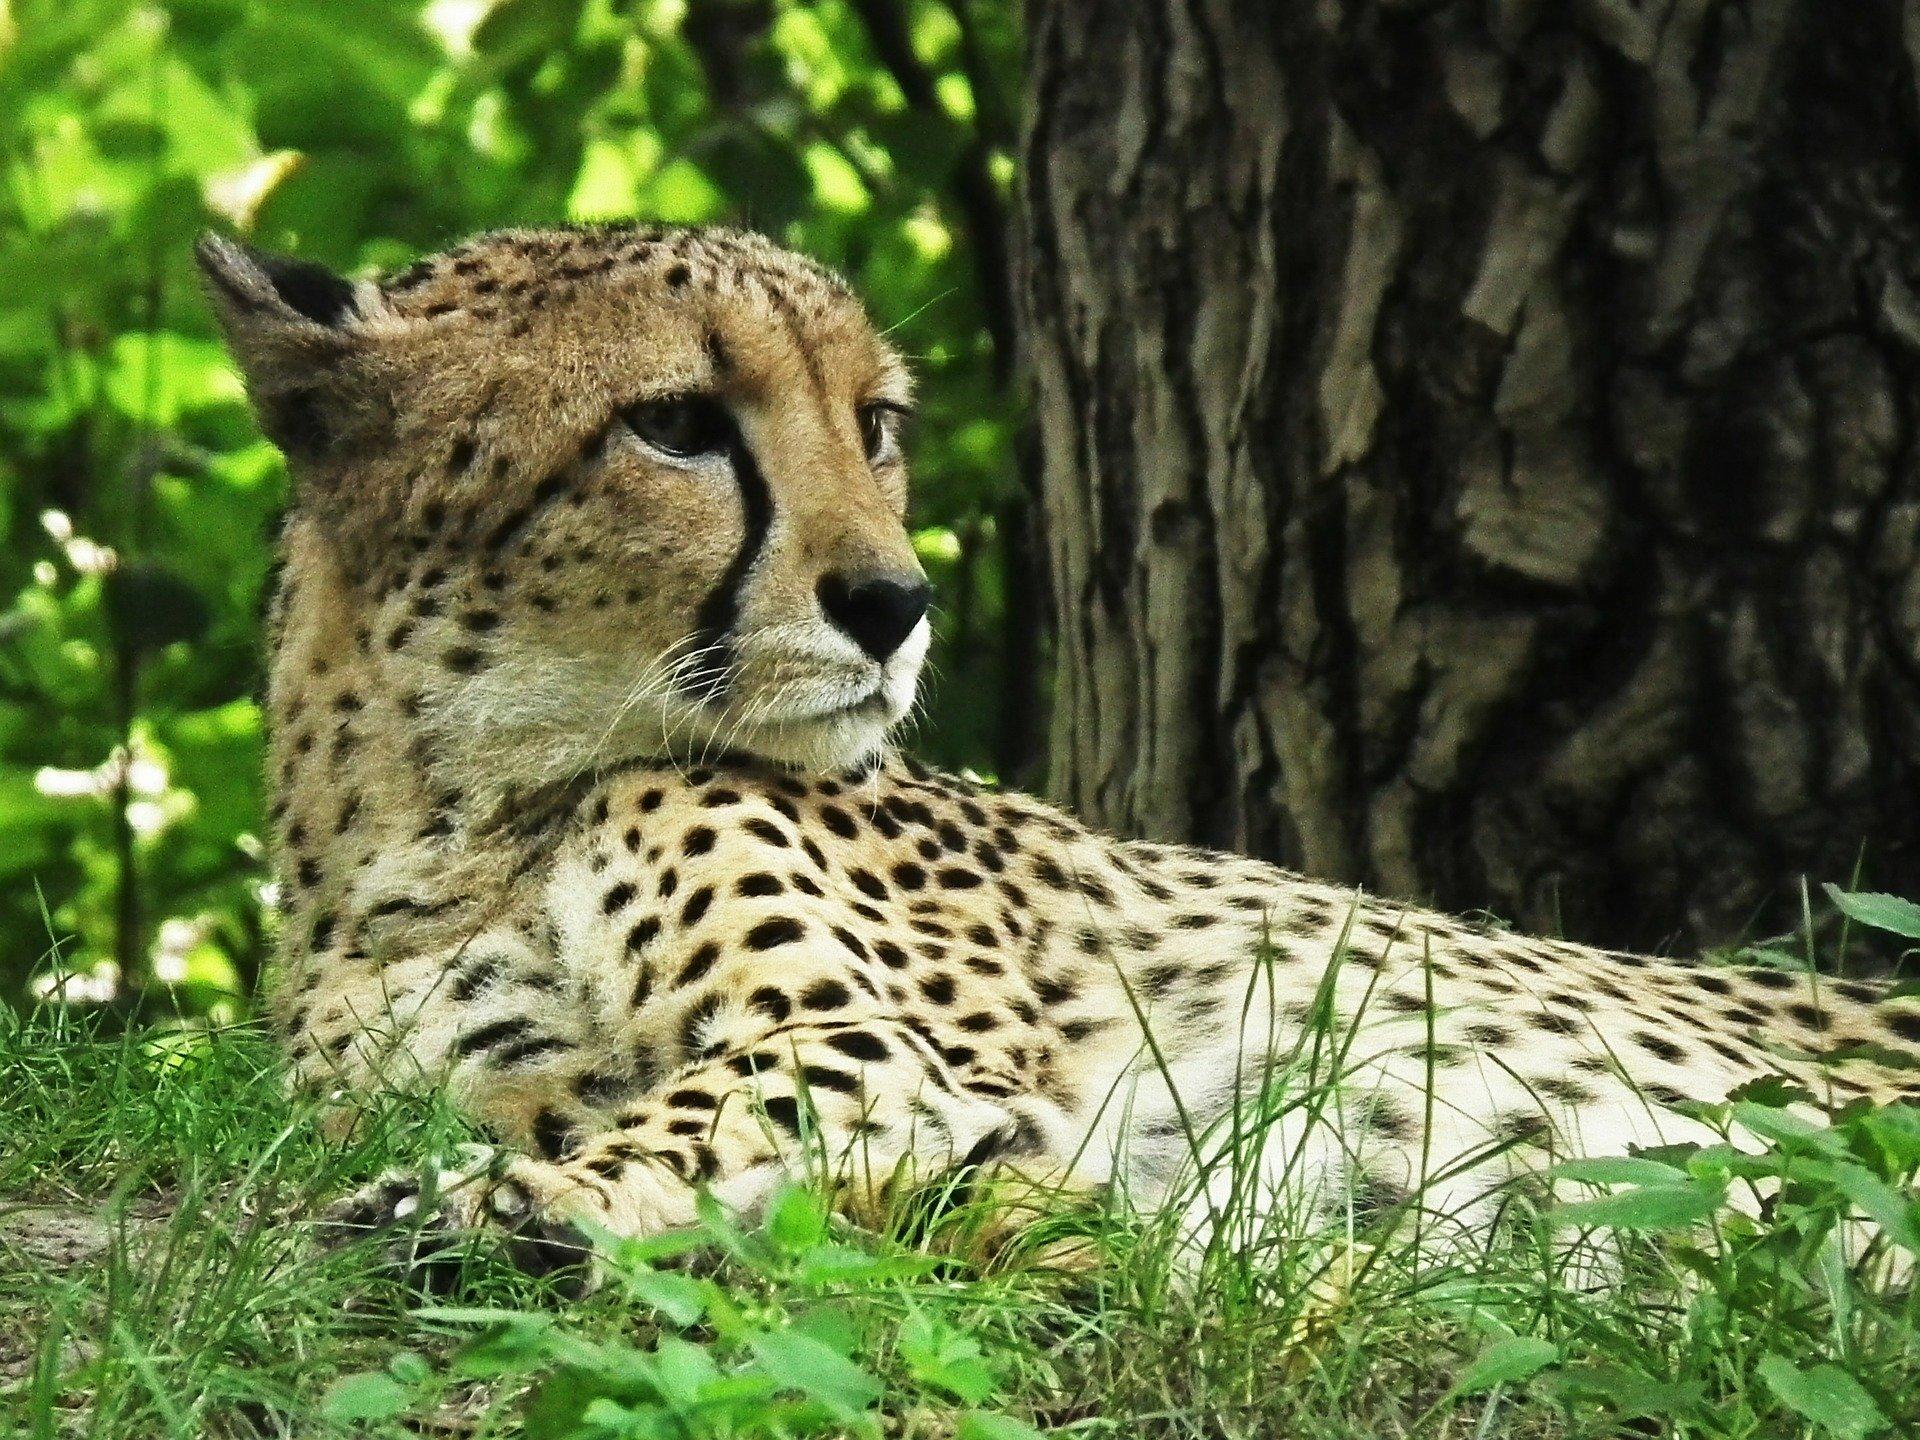 cheetah-425468_1920.jpg